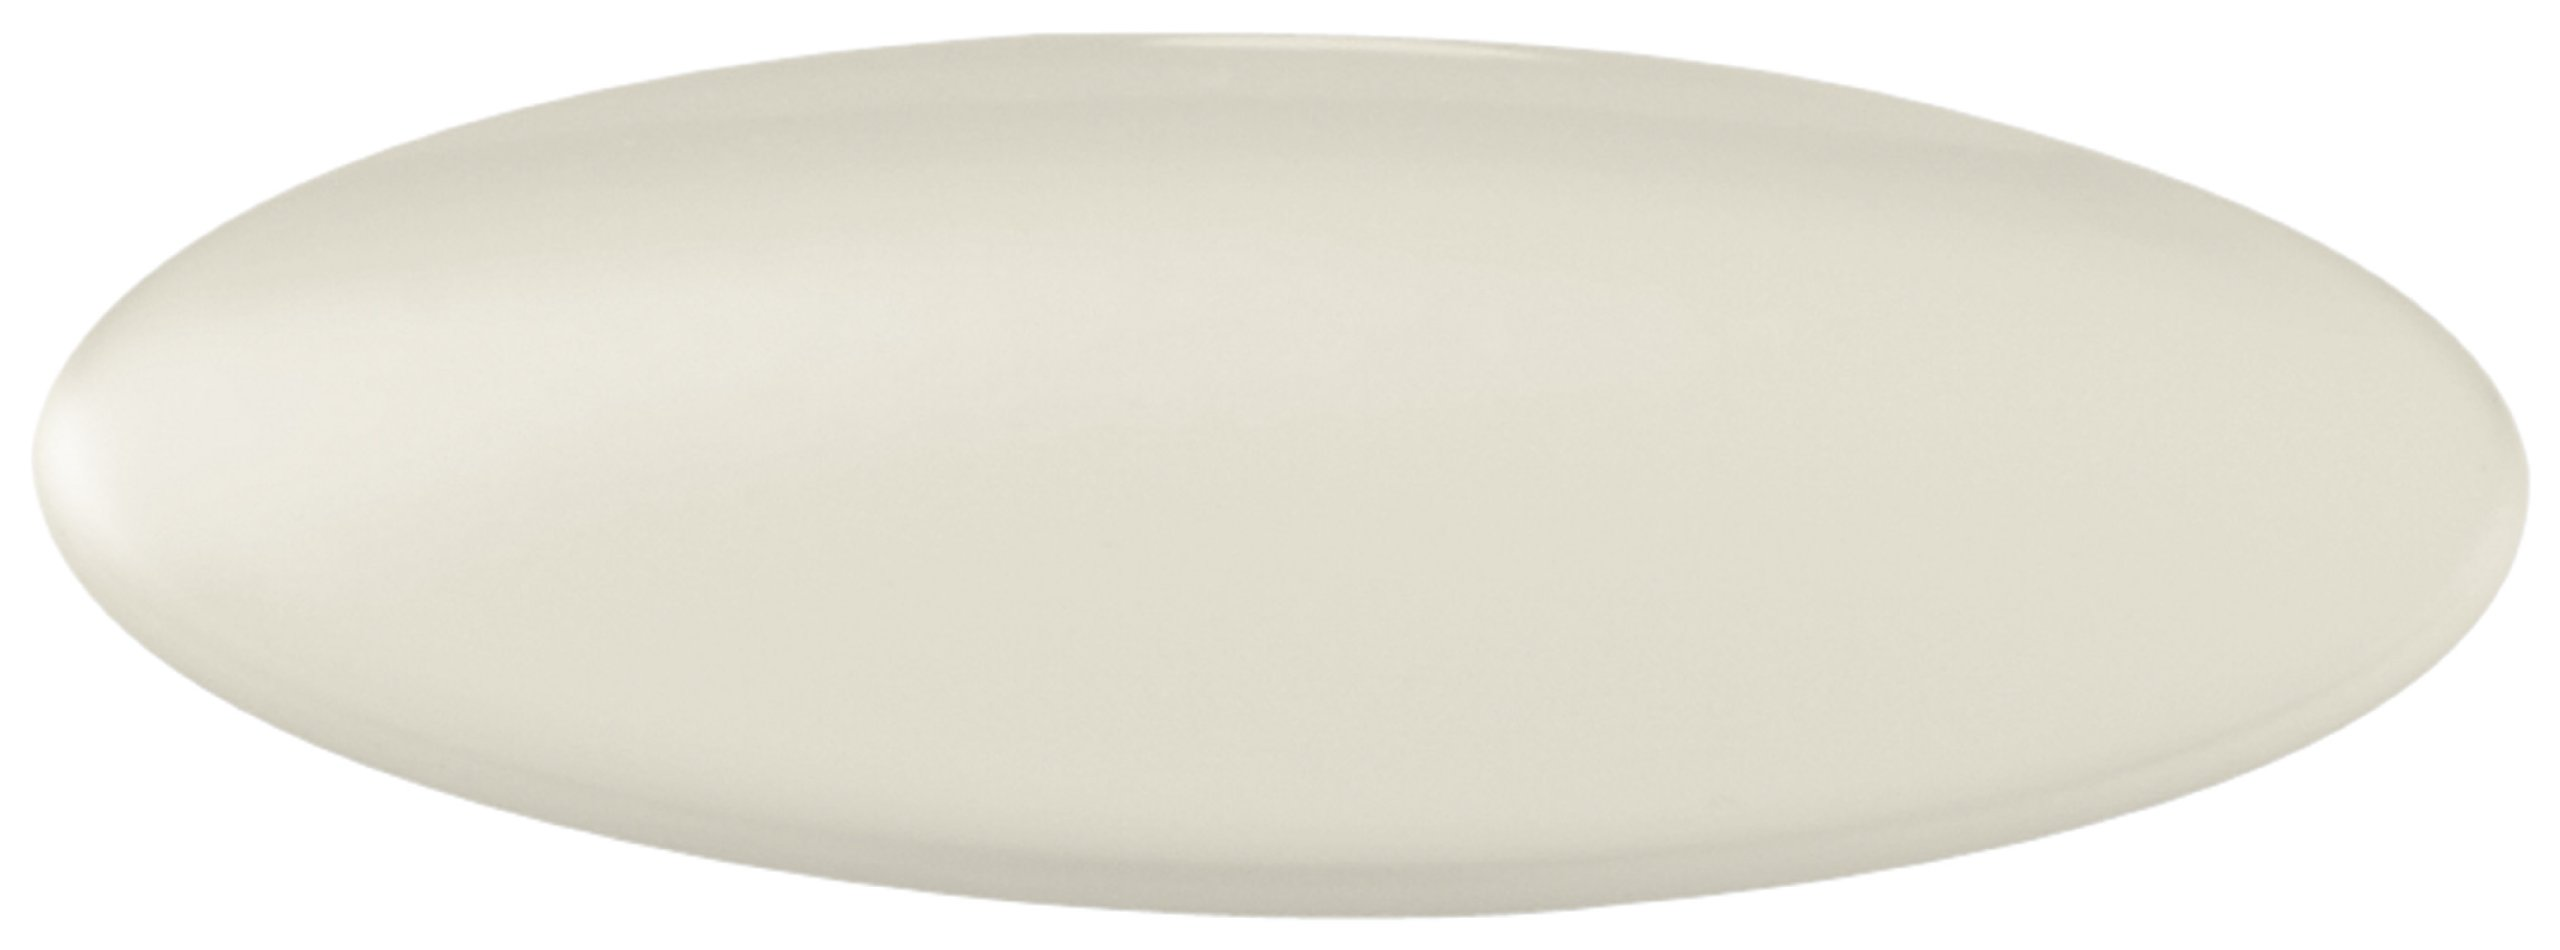 KOHLER K-8830-47 Sink Hole Cover, Almond